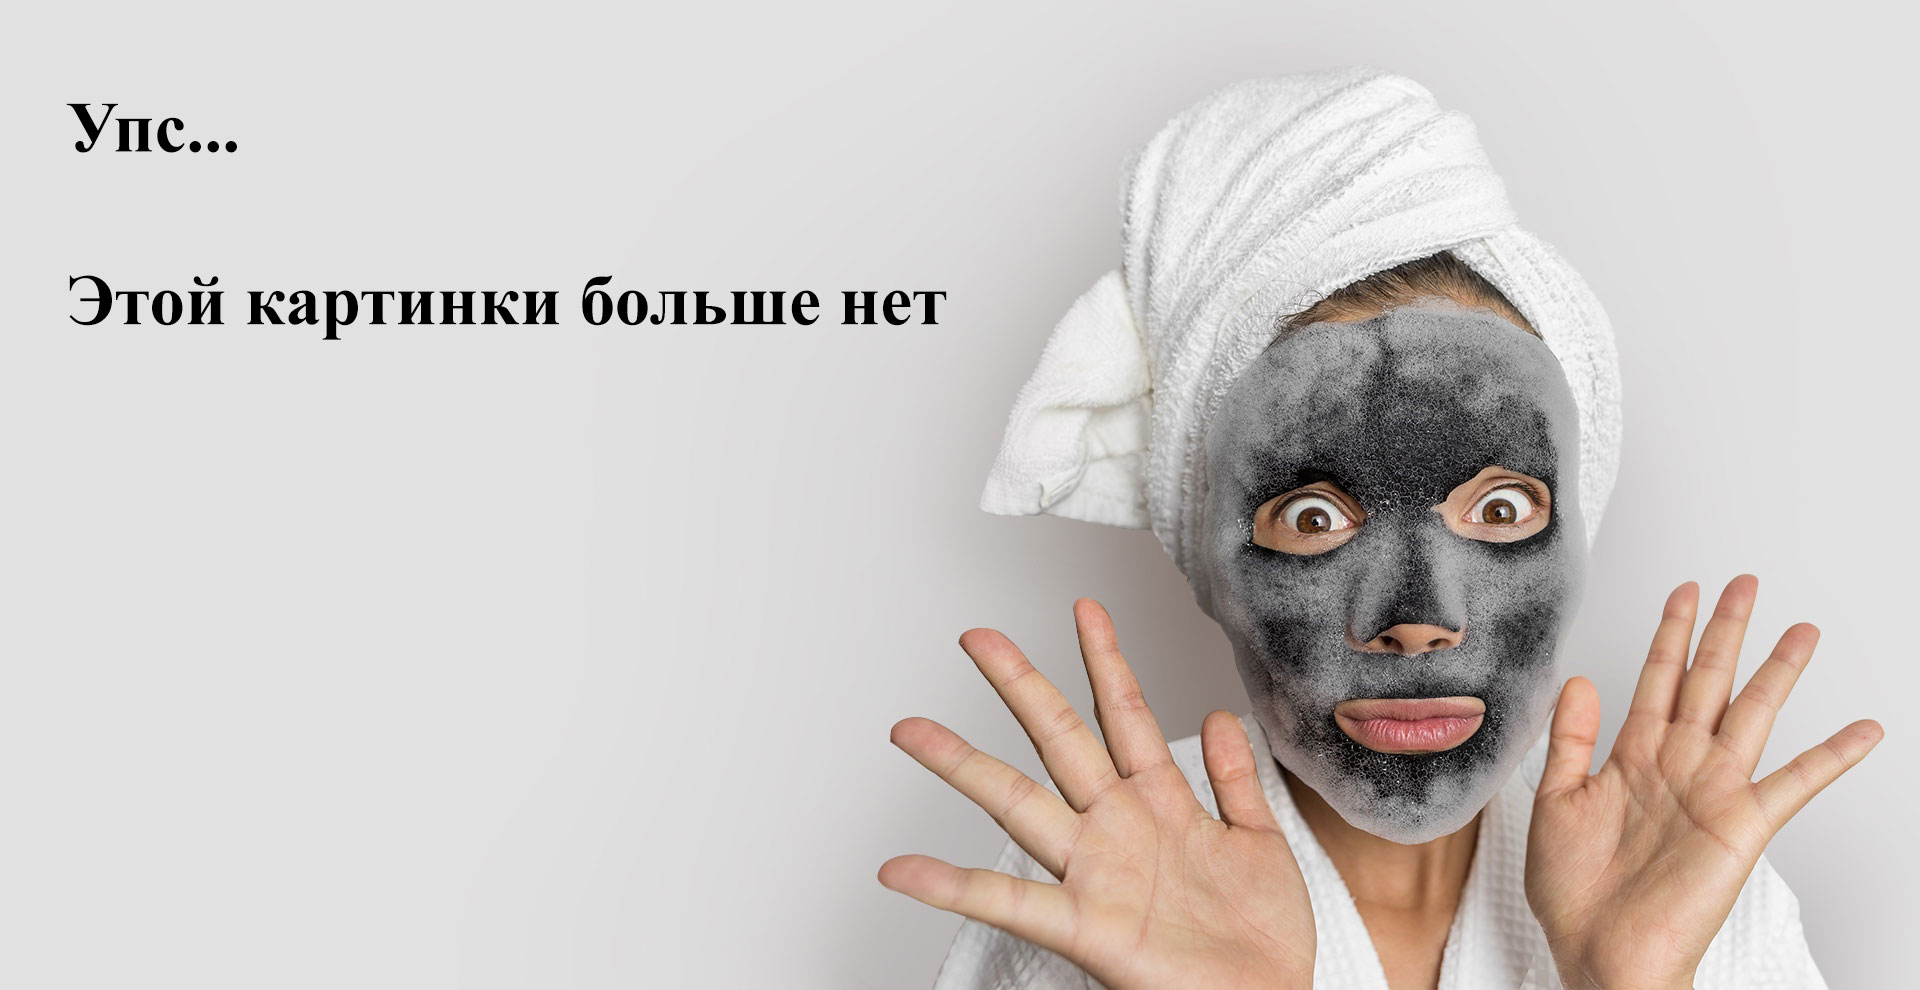 Organic Shop, Крем для ног «Хурма не вяжет, хурма шьет», 100 мл